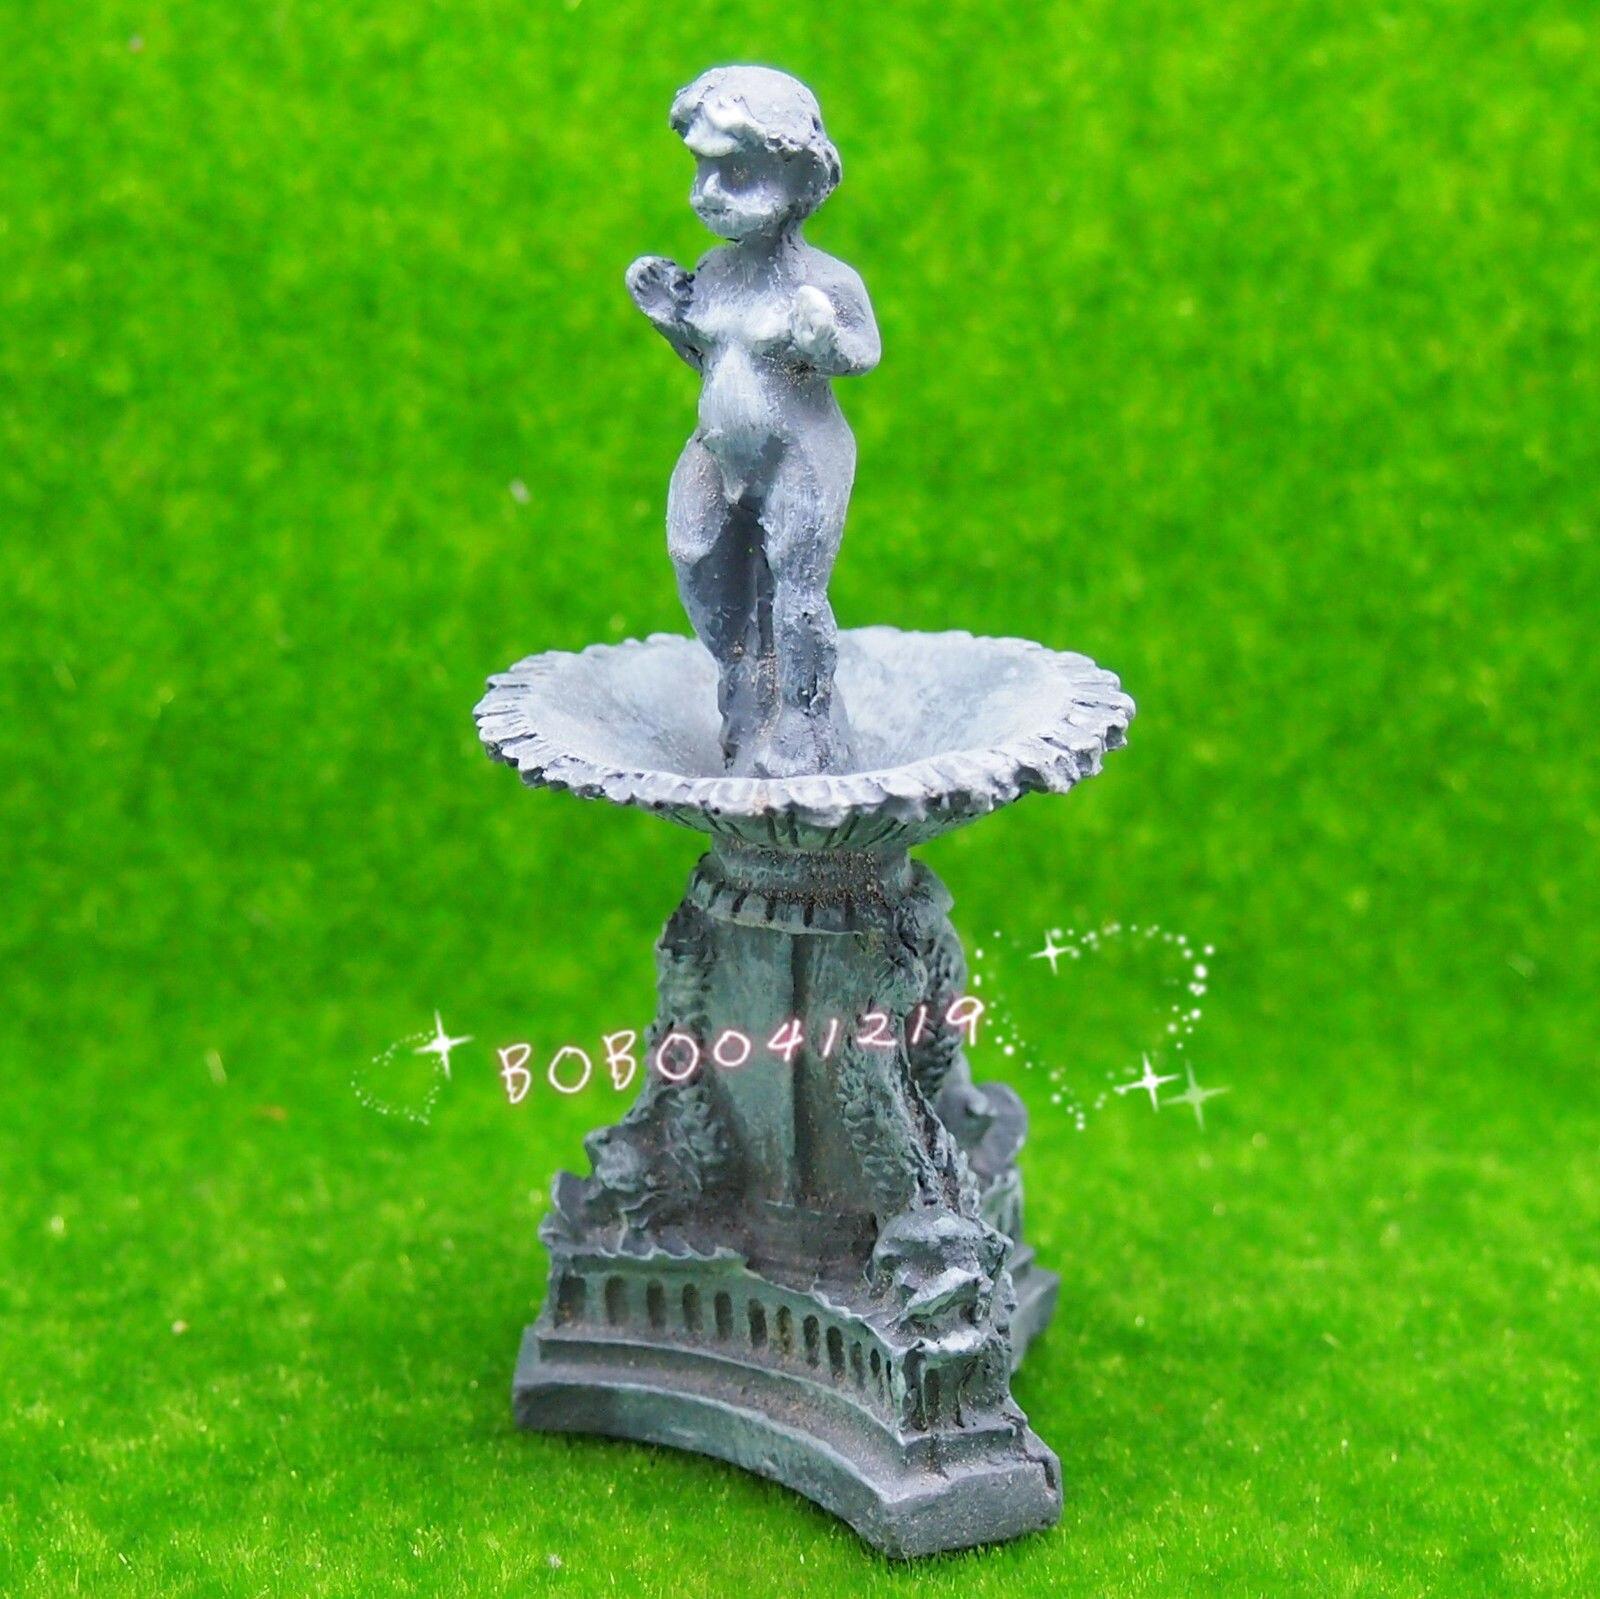 Dollhouse Miniature 1:12 Jouet Jardin Un Vert Résine ... tout Fontaine De Jardin En Resine